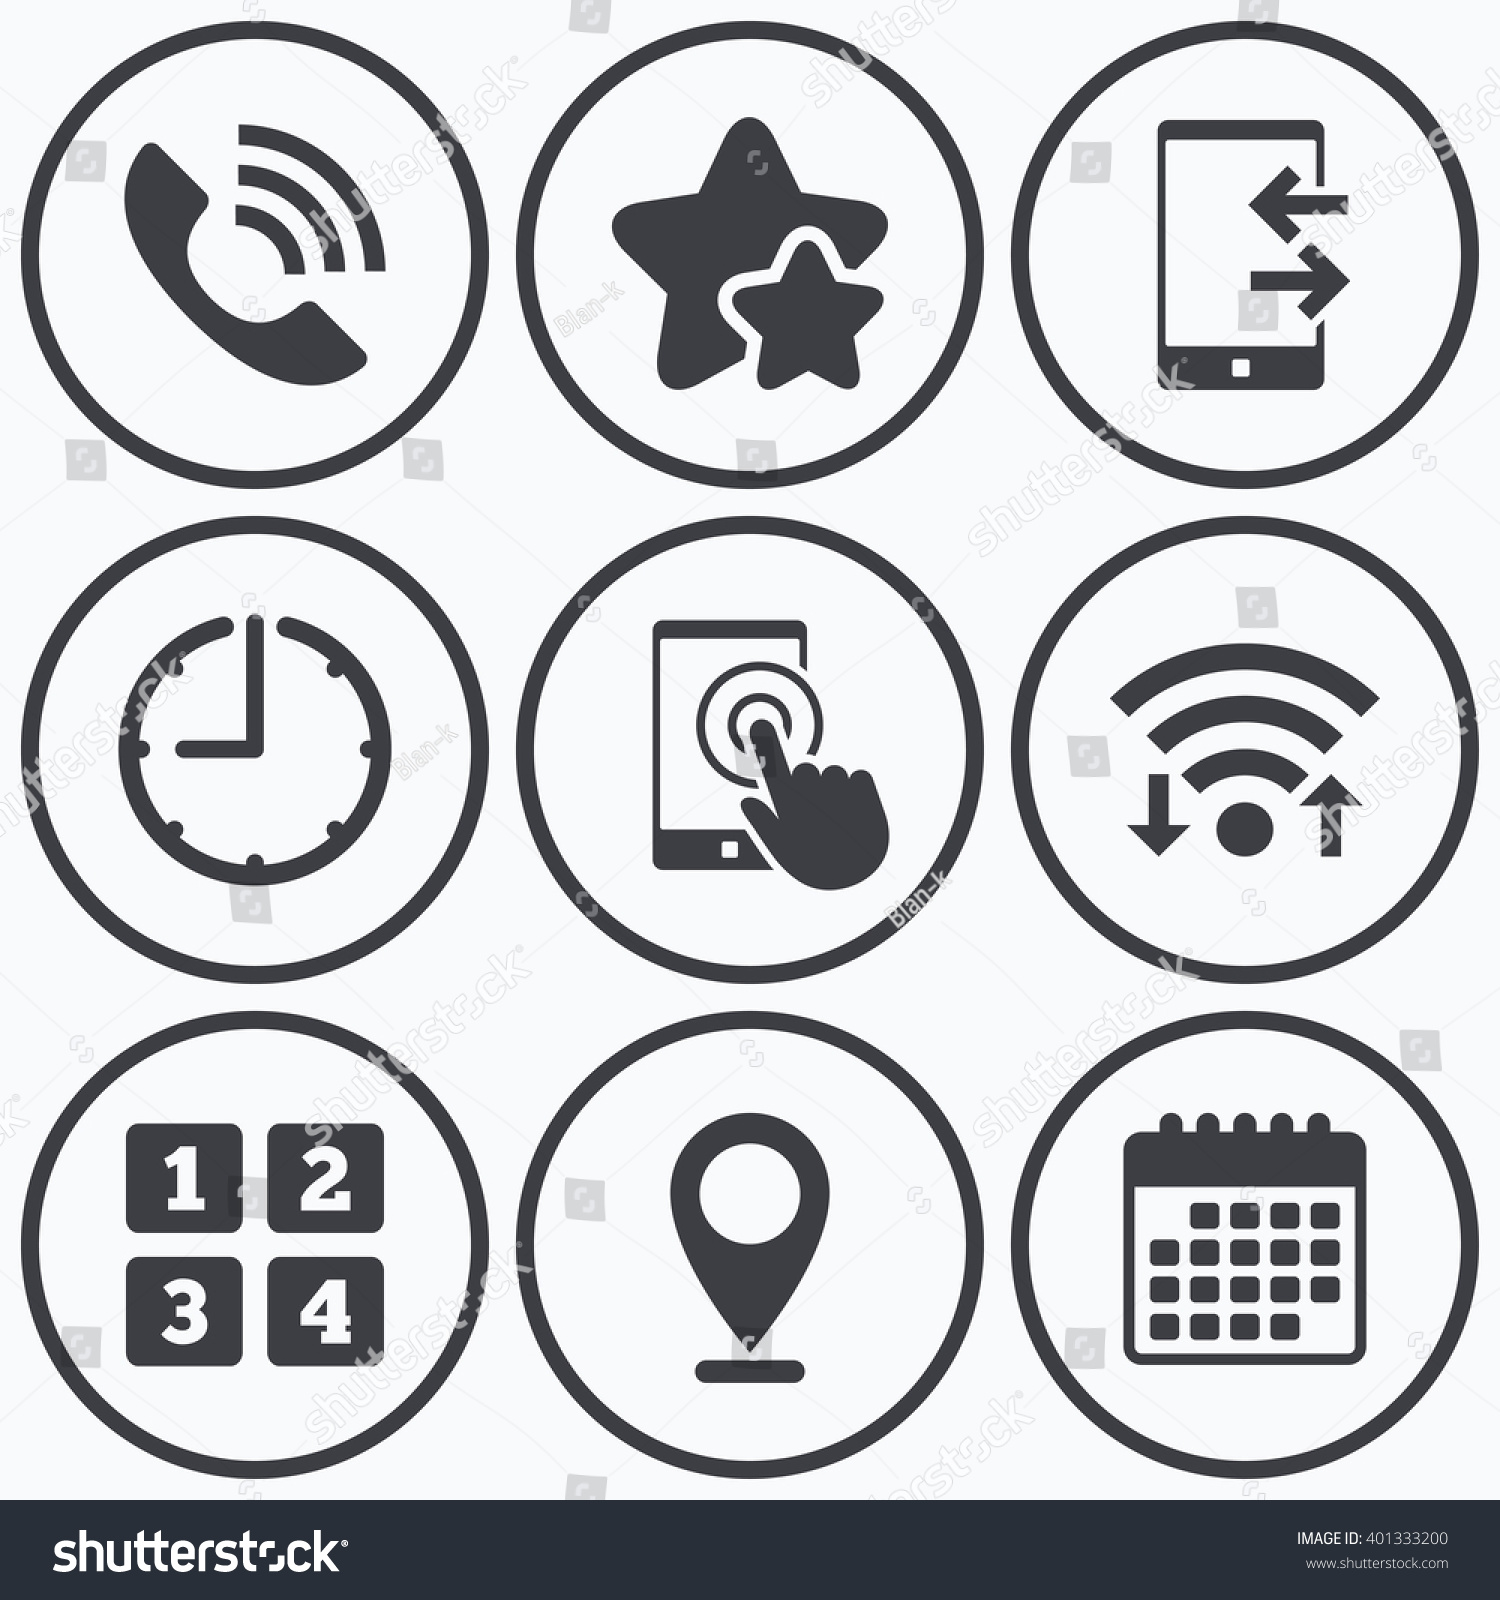 Clock wifi stars icons phone icons stock vector 401333200 clock wifi and stars icons phone icons touch screen smartphone sign call biocorpaavc